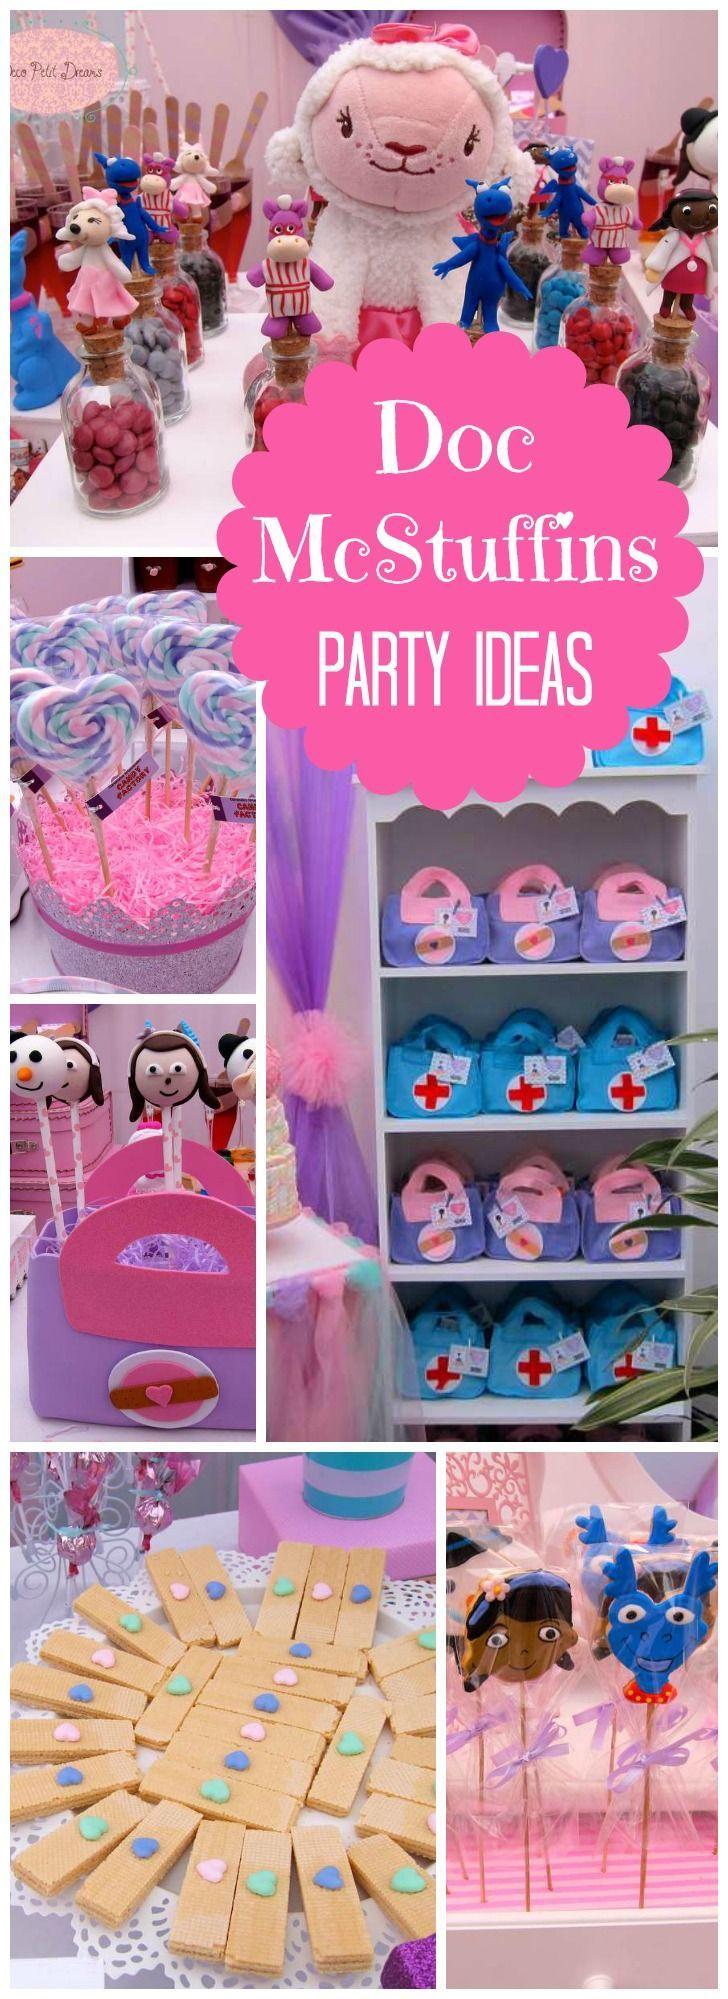 56 Best Doc Mcstuffins Birthday Party Ideas Images On Pinterest